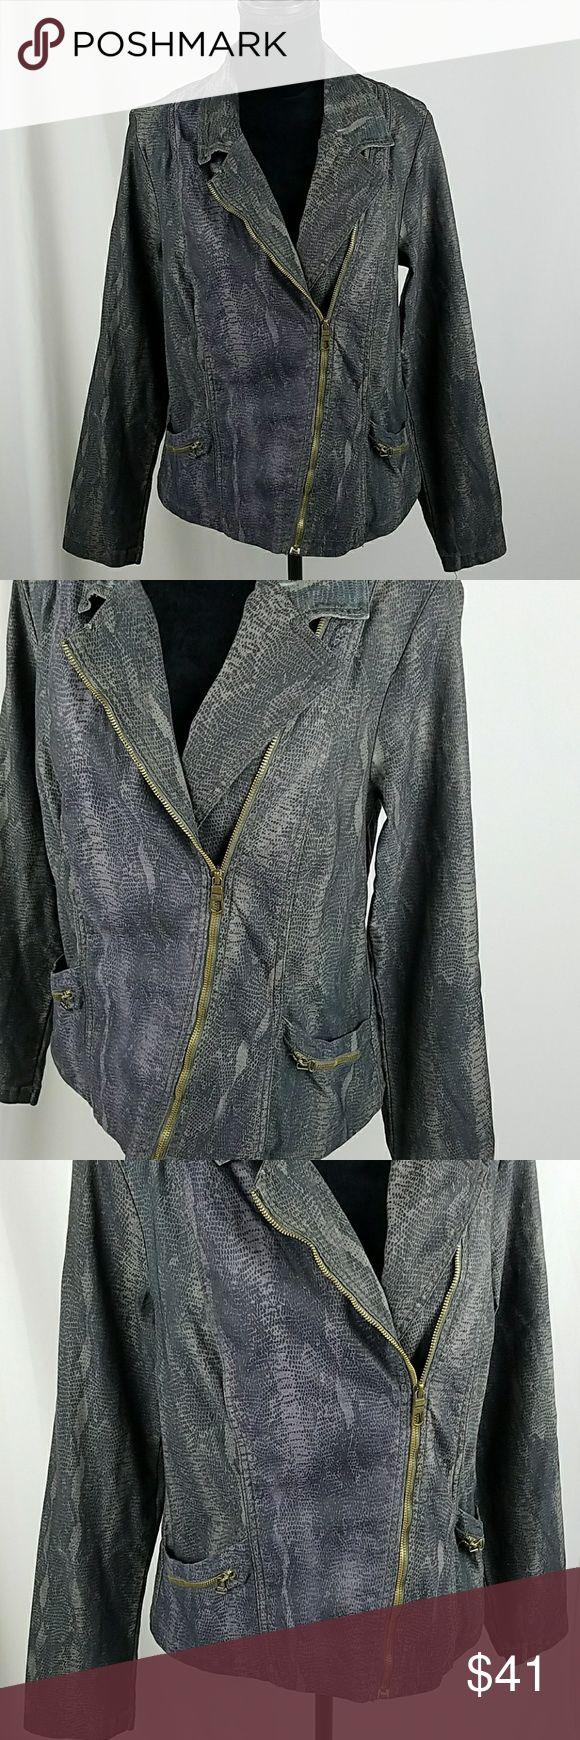 "XCVI women XL moto jacket blazer pockets animal pr XCVI women XL moto jacket blazer pockets animal print zip up, 77% cotton, 21% polyester, 2% spandex.  Under arm to under arm: 21"" Waist side to side: 19.25"" Length: 25.5"" XCVI Jackets & Coats"